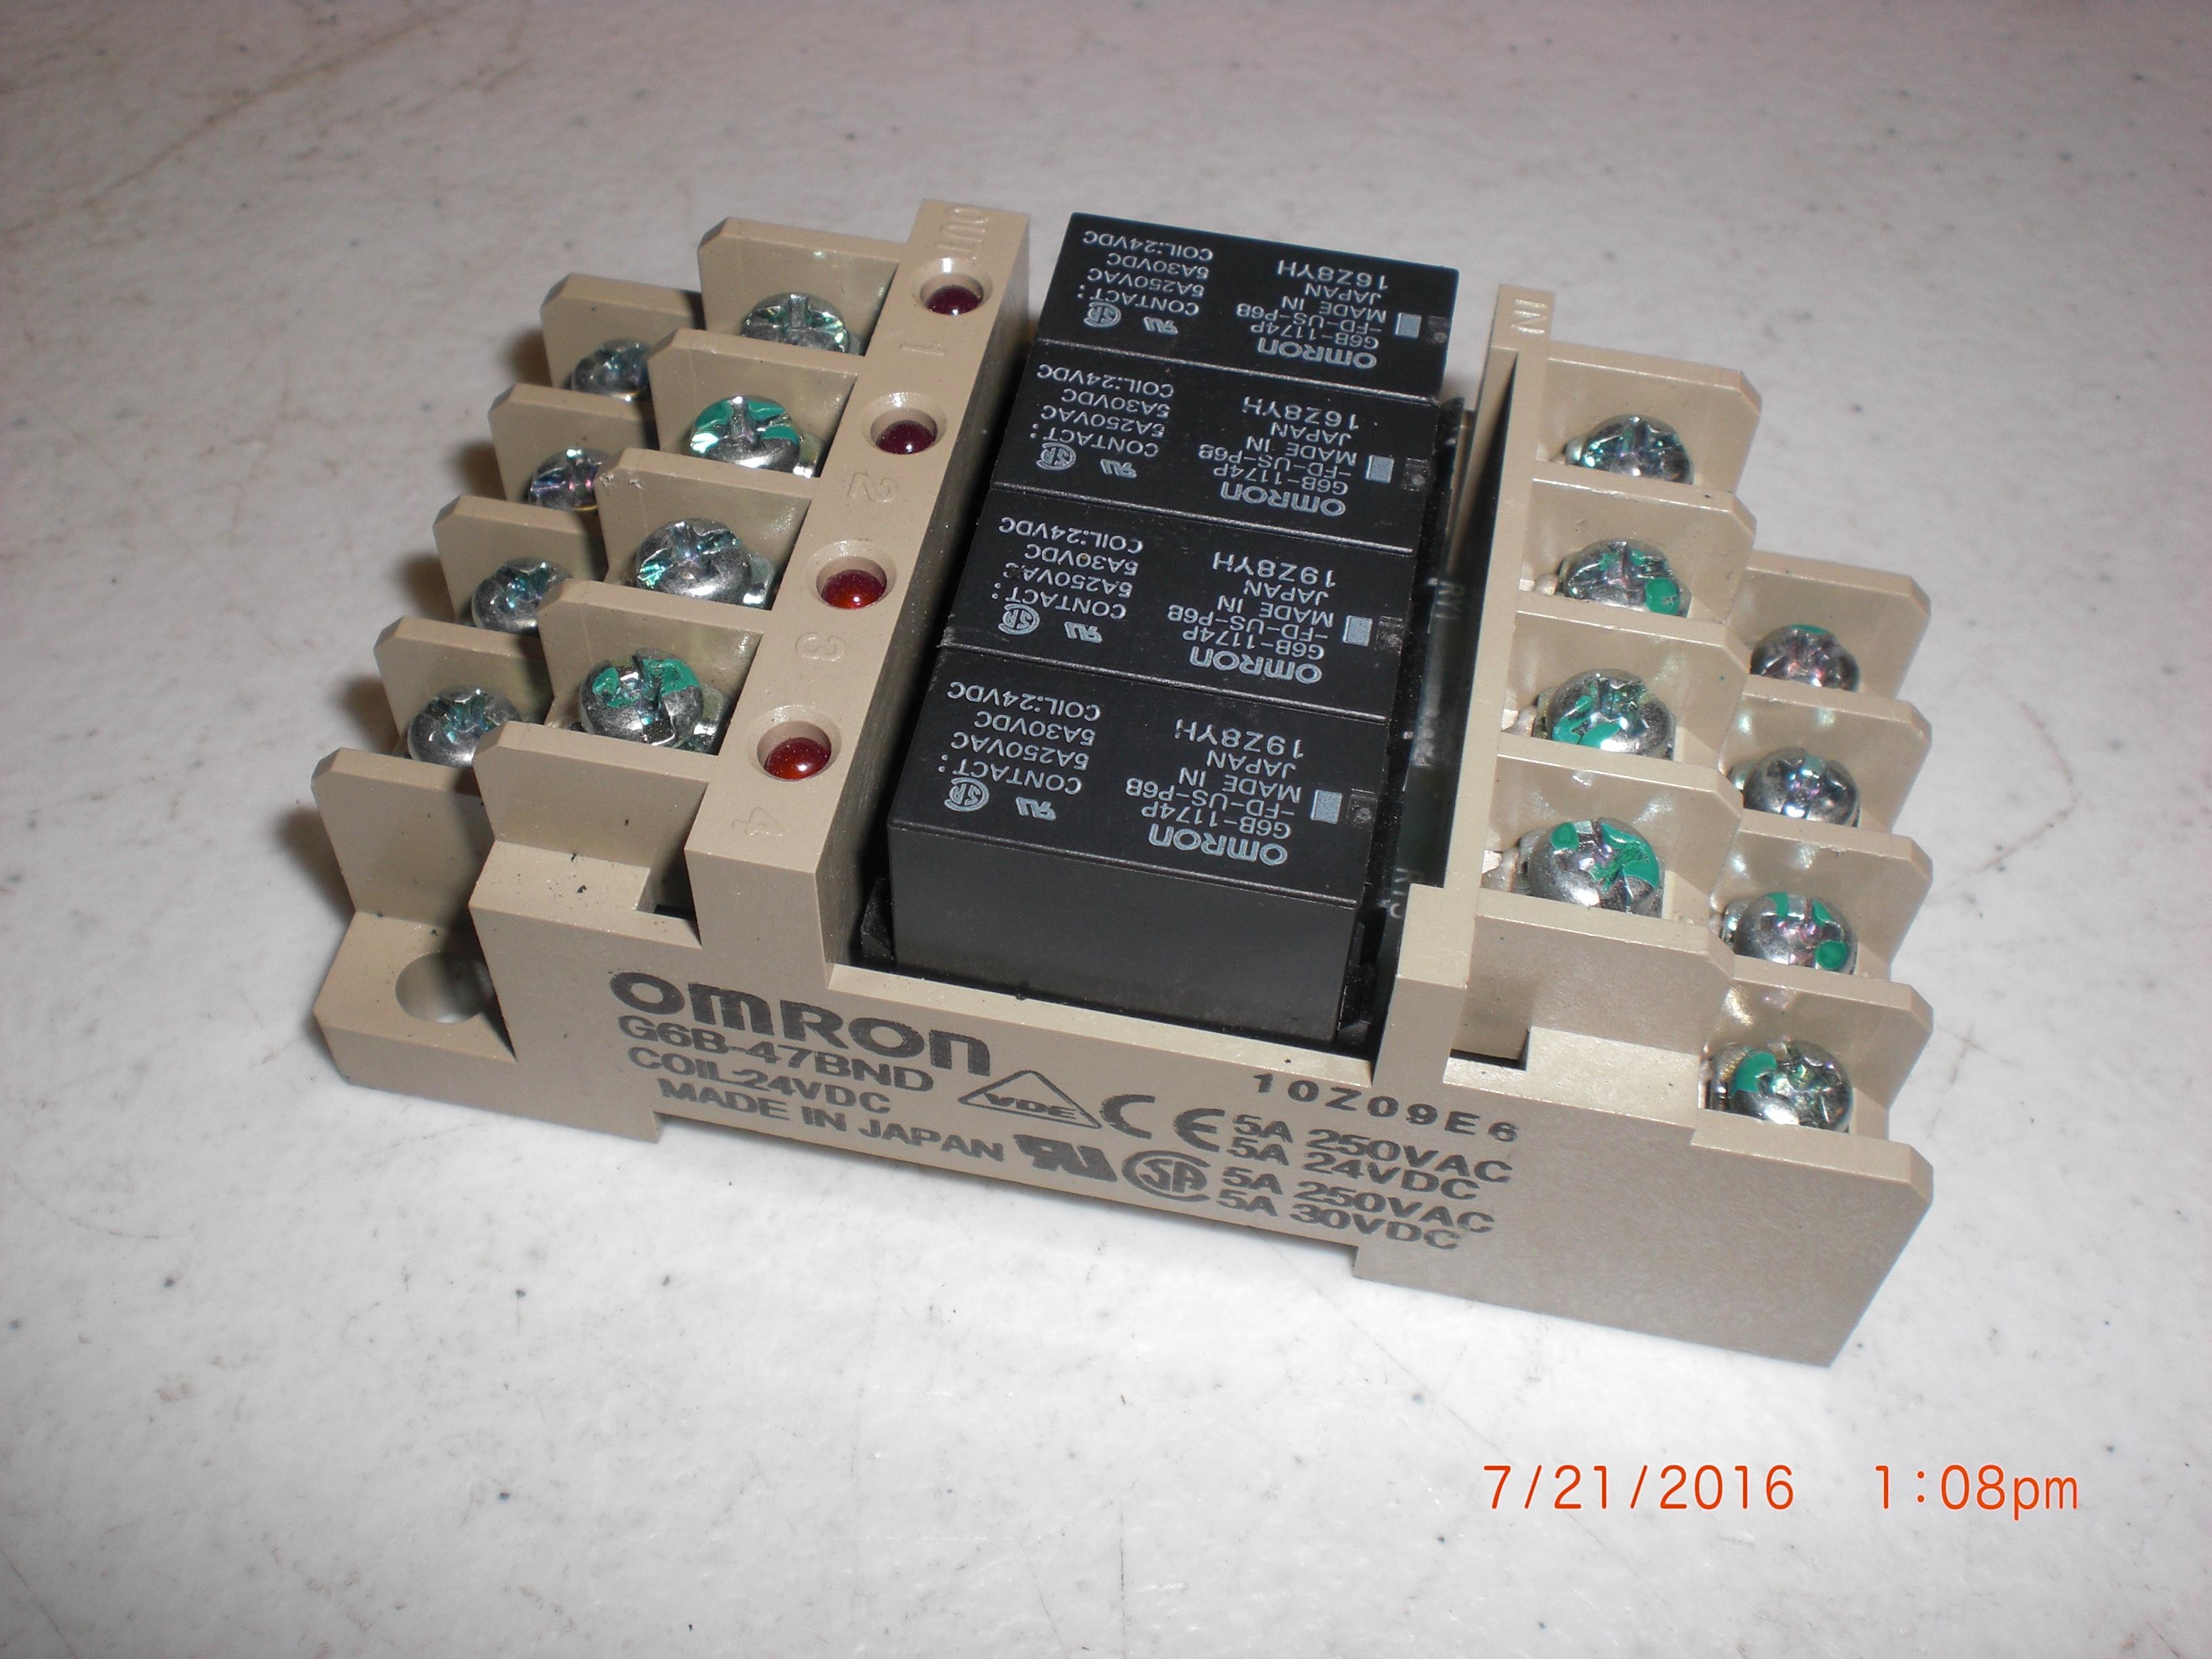 Relay din base w/4 OMRON G6B-1174P relay 24VDC 250VAC/30VDC 5A